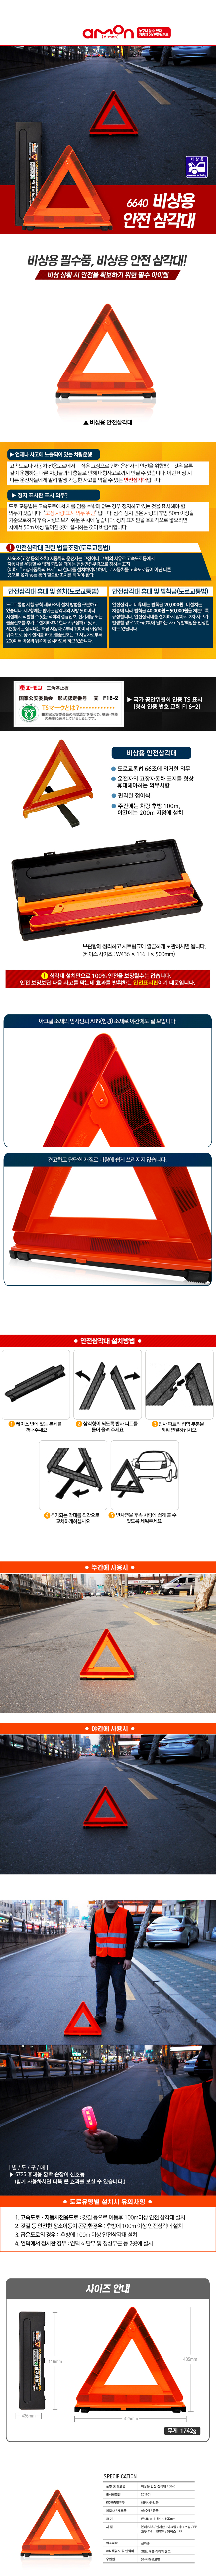 AMON 6640 비상용 필수품 안전삼각대 반사판 교통 안전용품